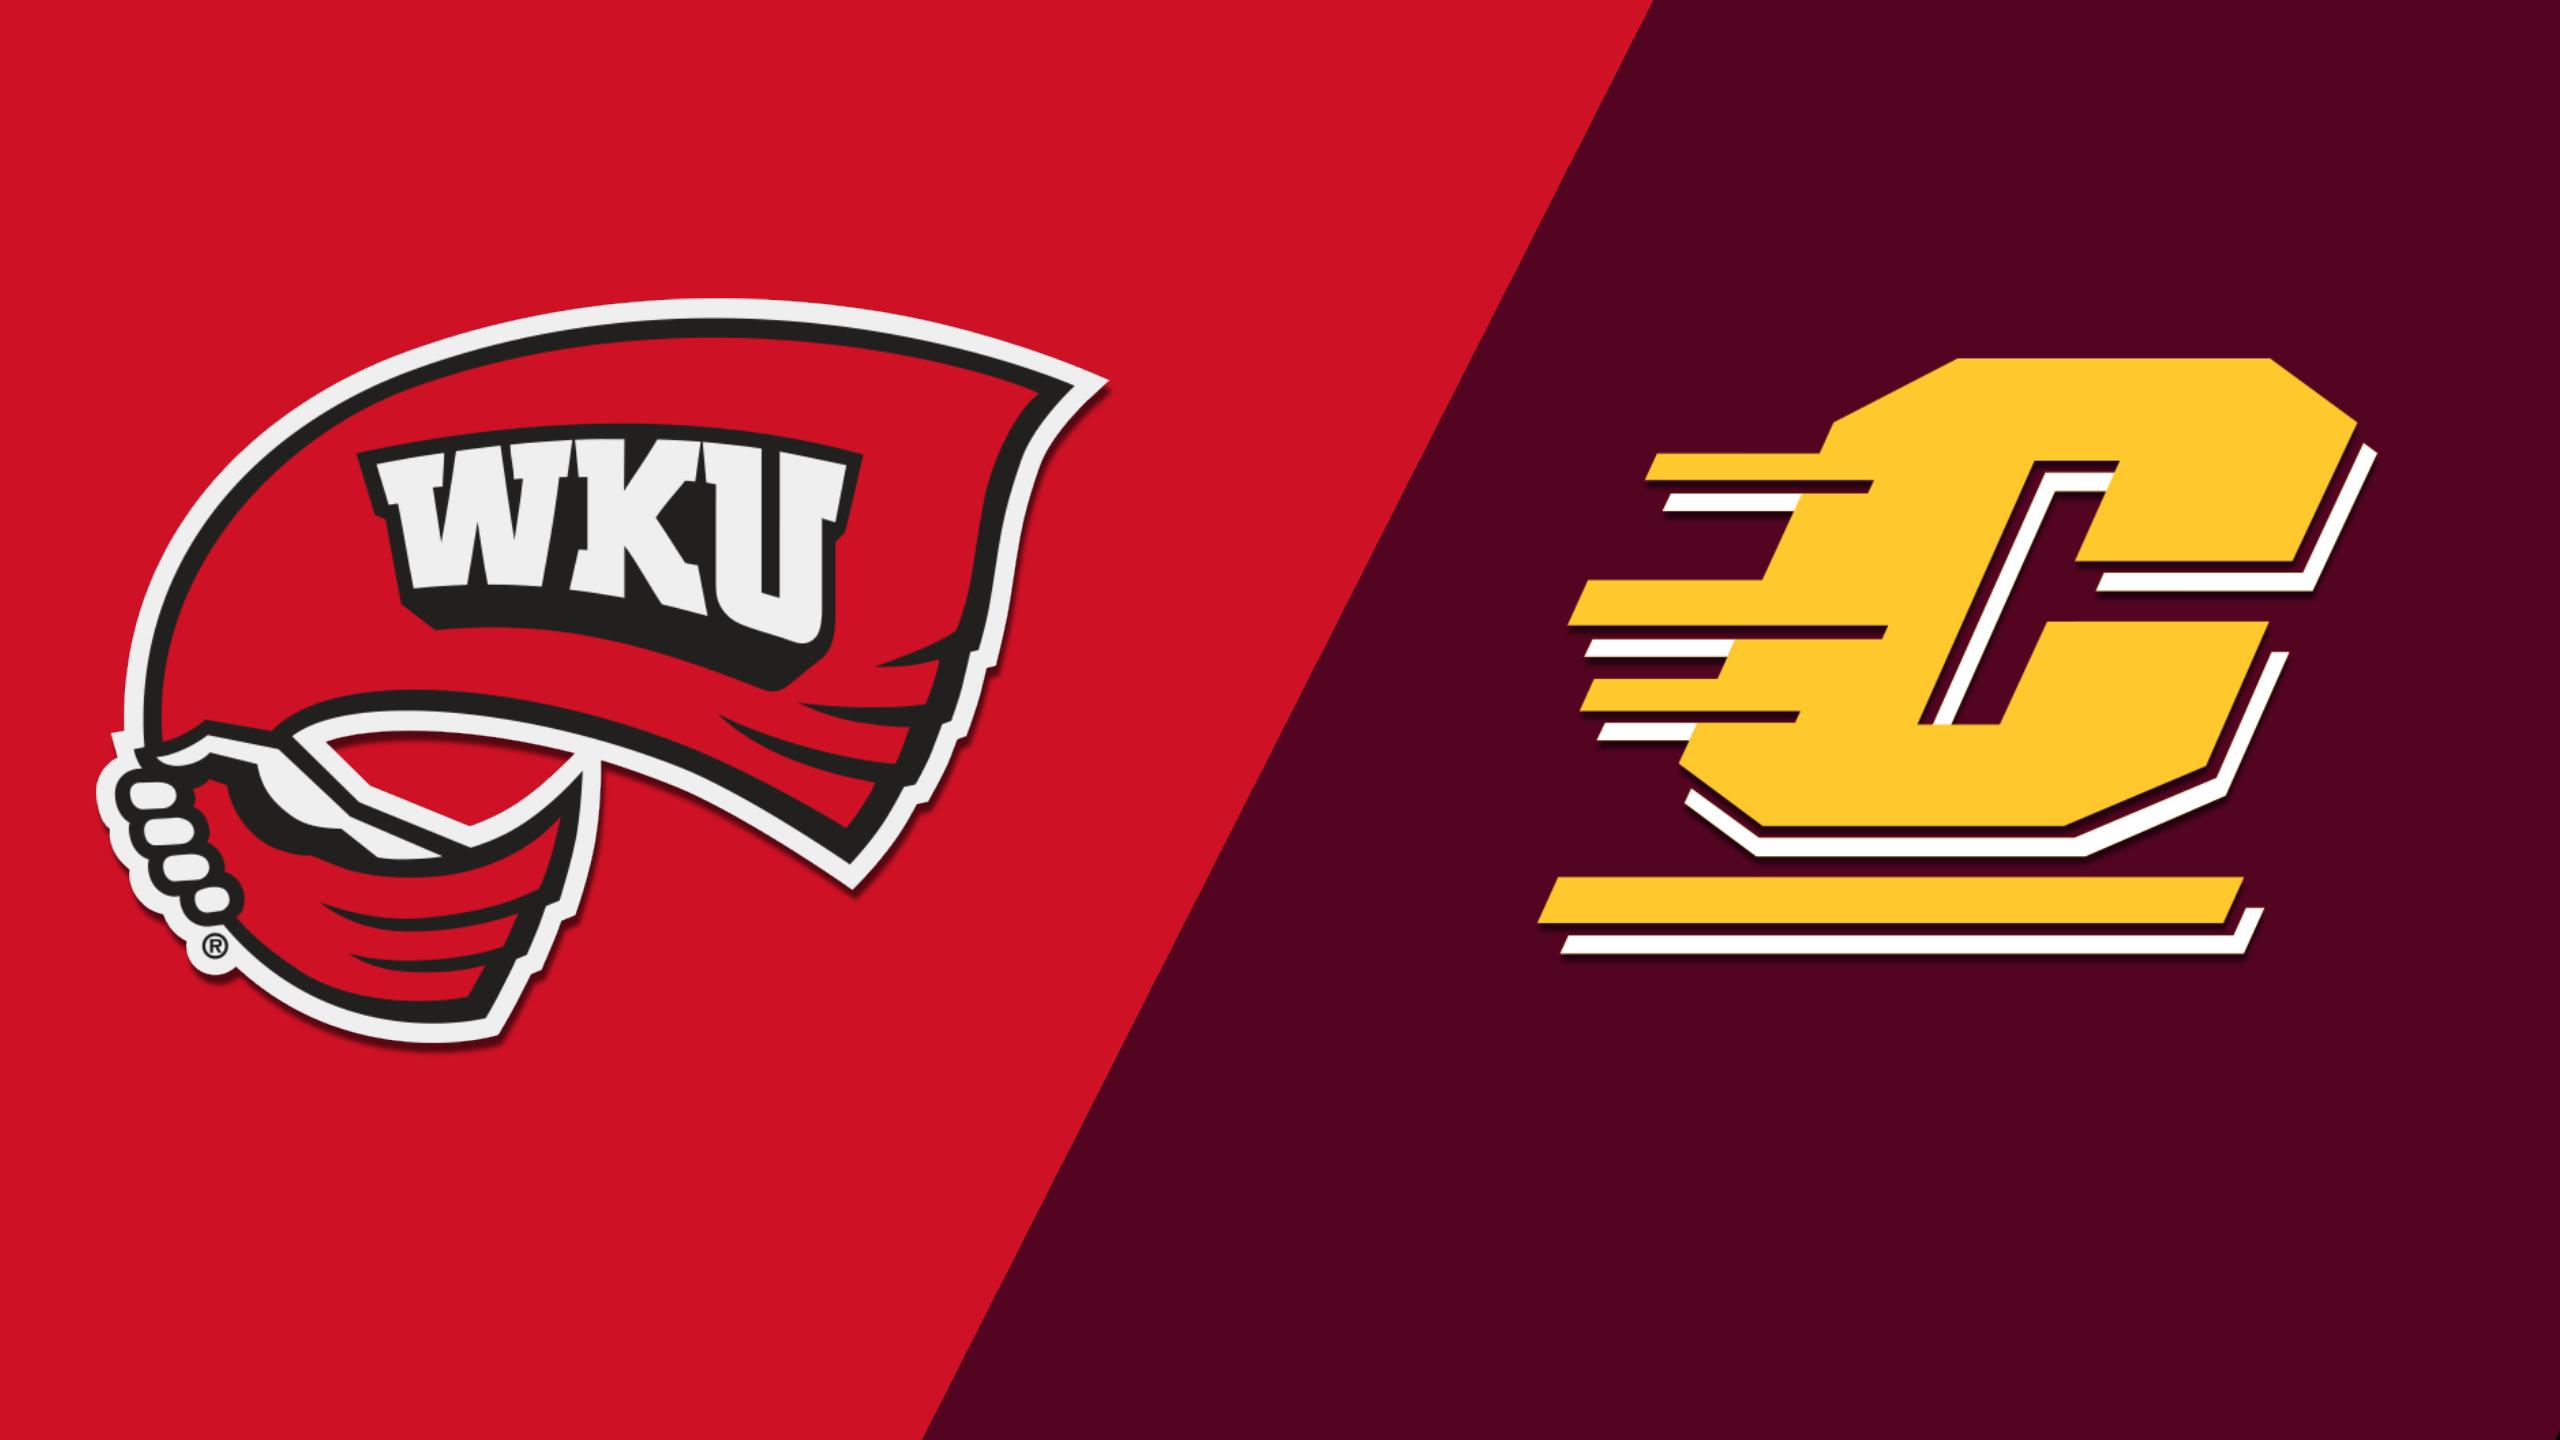 Western Kentucky vs. Central Michigan (W Basketball)